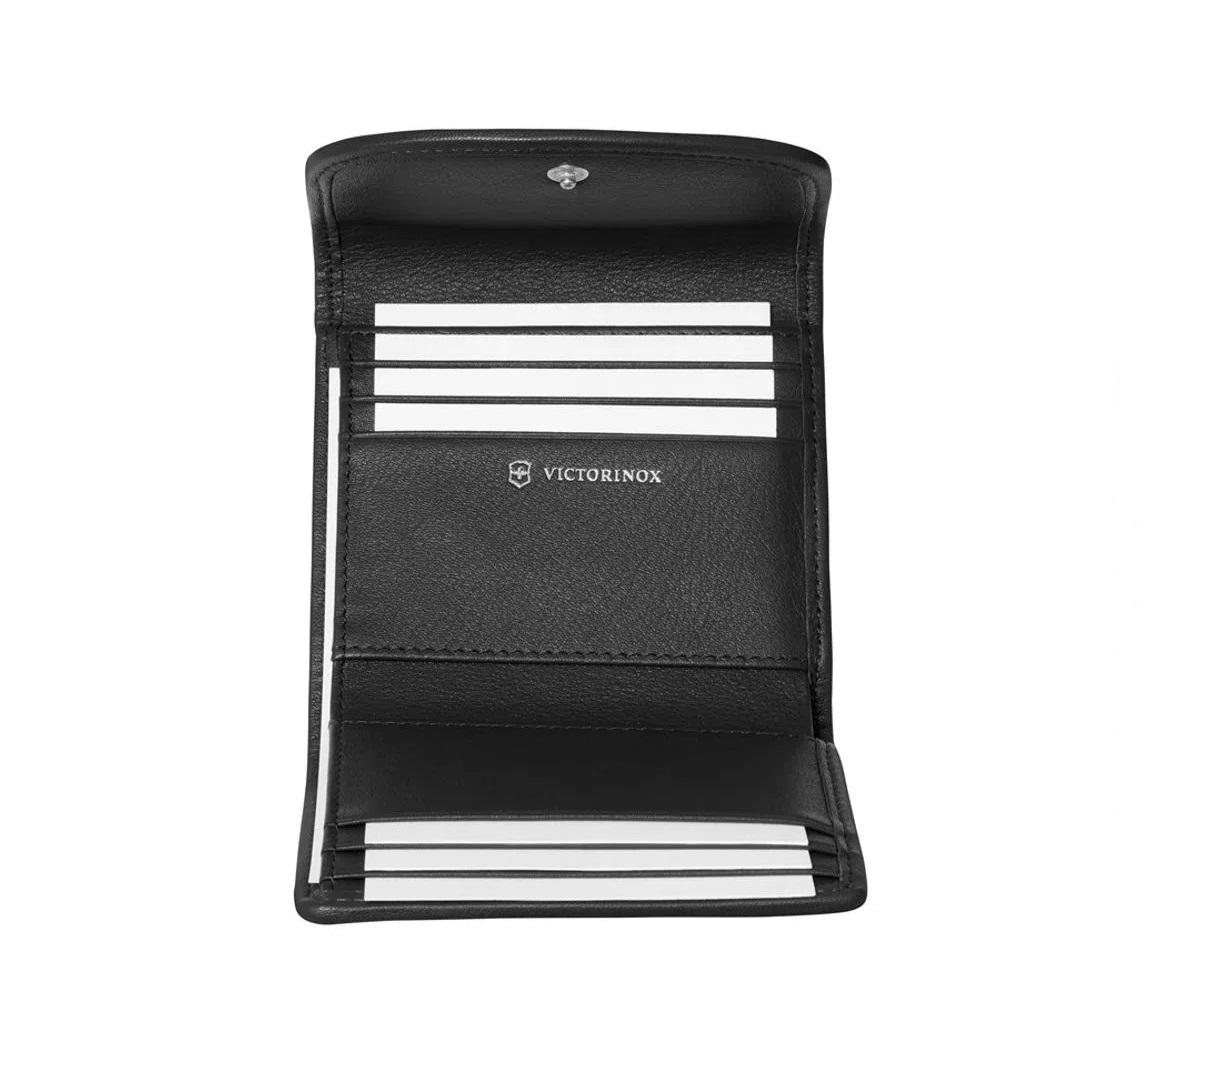 Carteira feminina Victoria 2.0 Envelope Victorinox Preta 606667  - Mix Eletro